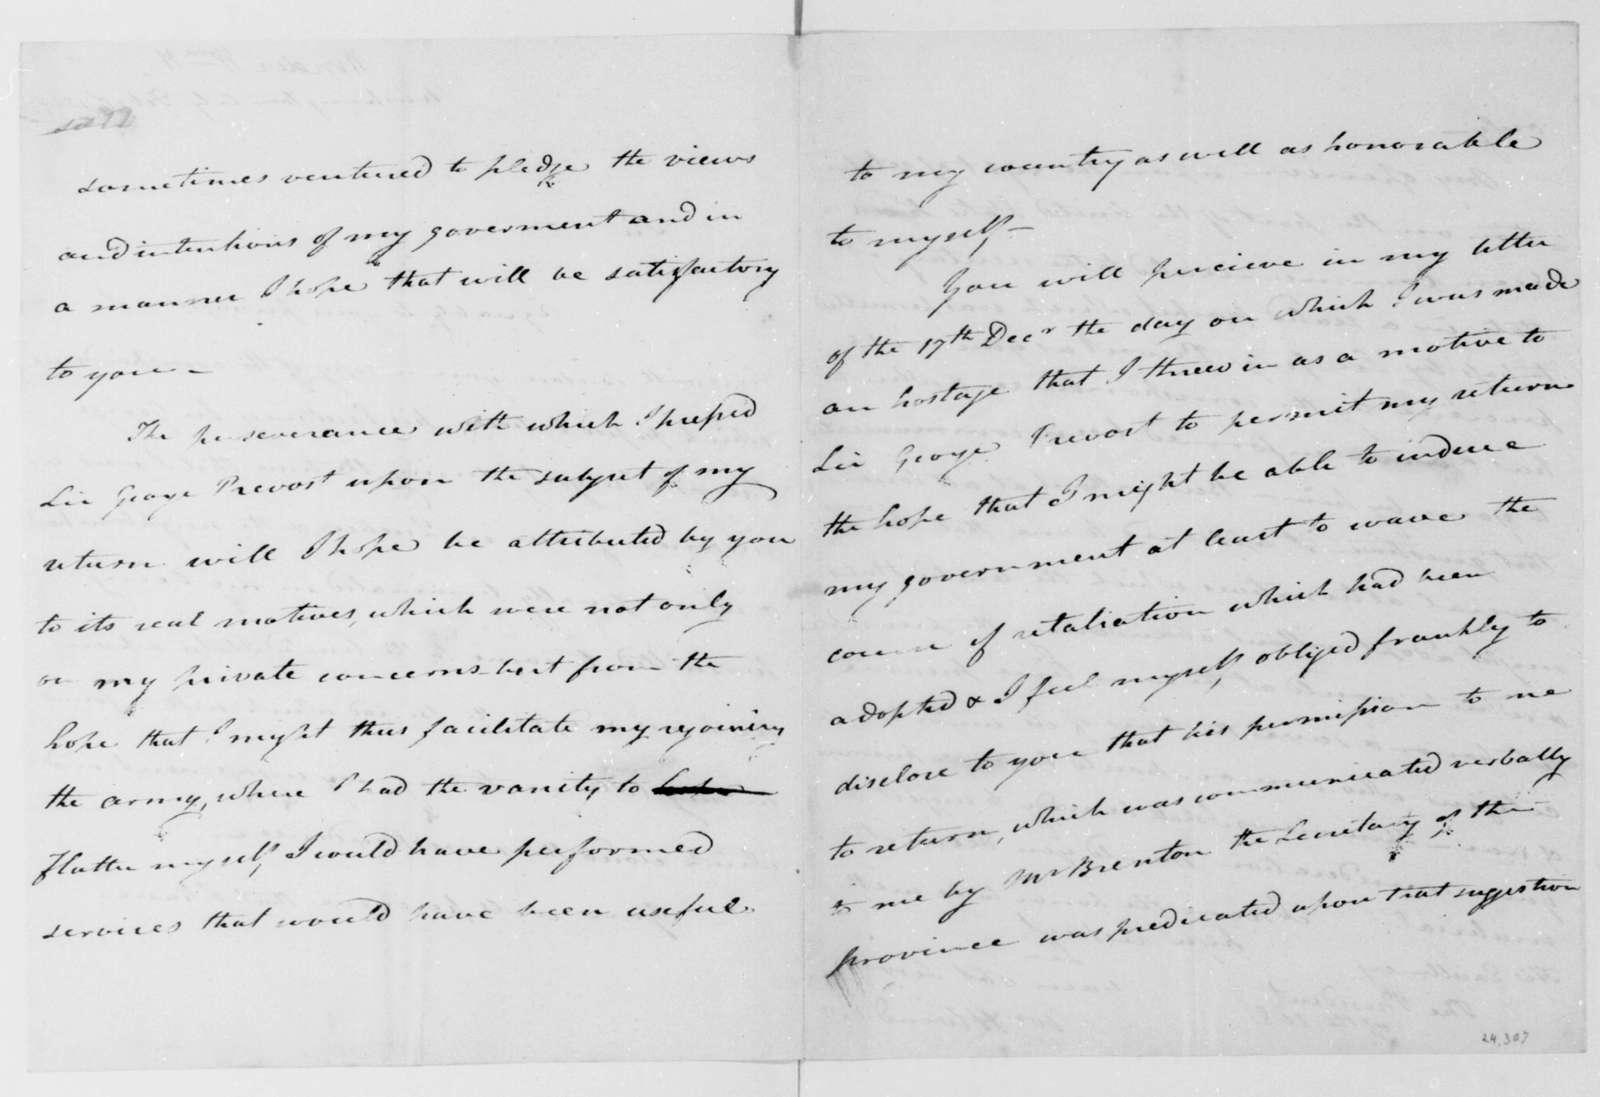 William H. Winder to James Madison, February 1, 1814.